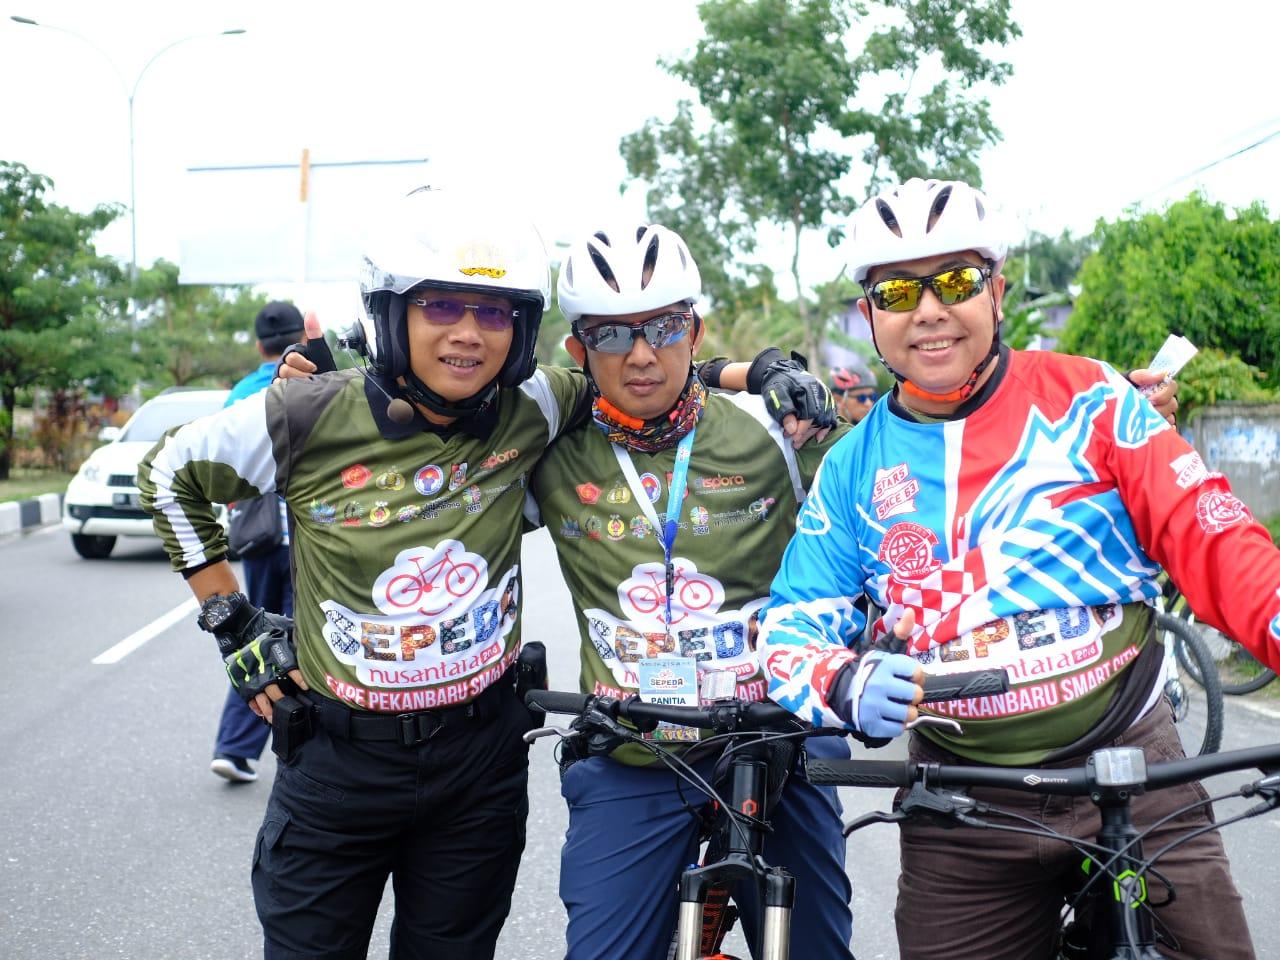 Kapolresta Pimpin Langsung Pam Gowes Nusantara Etape Pekanbaru